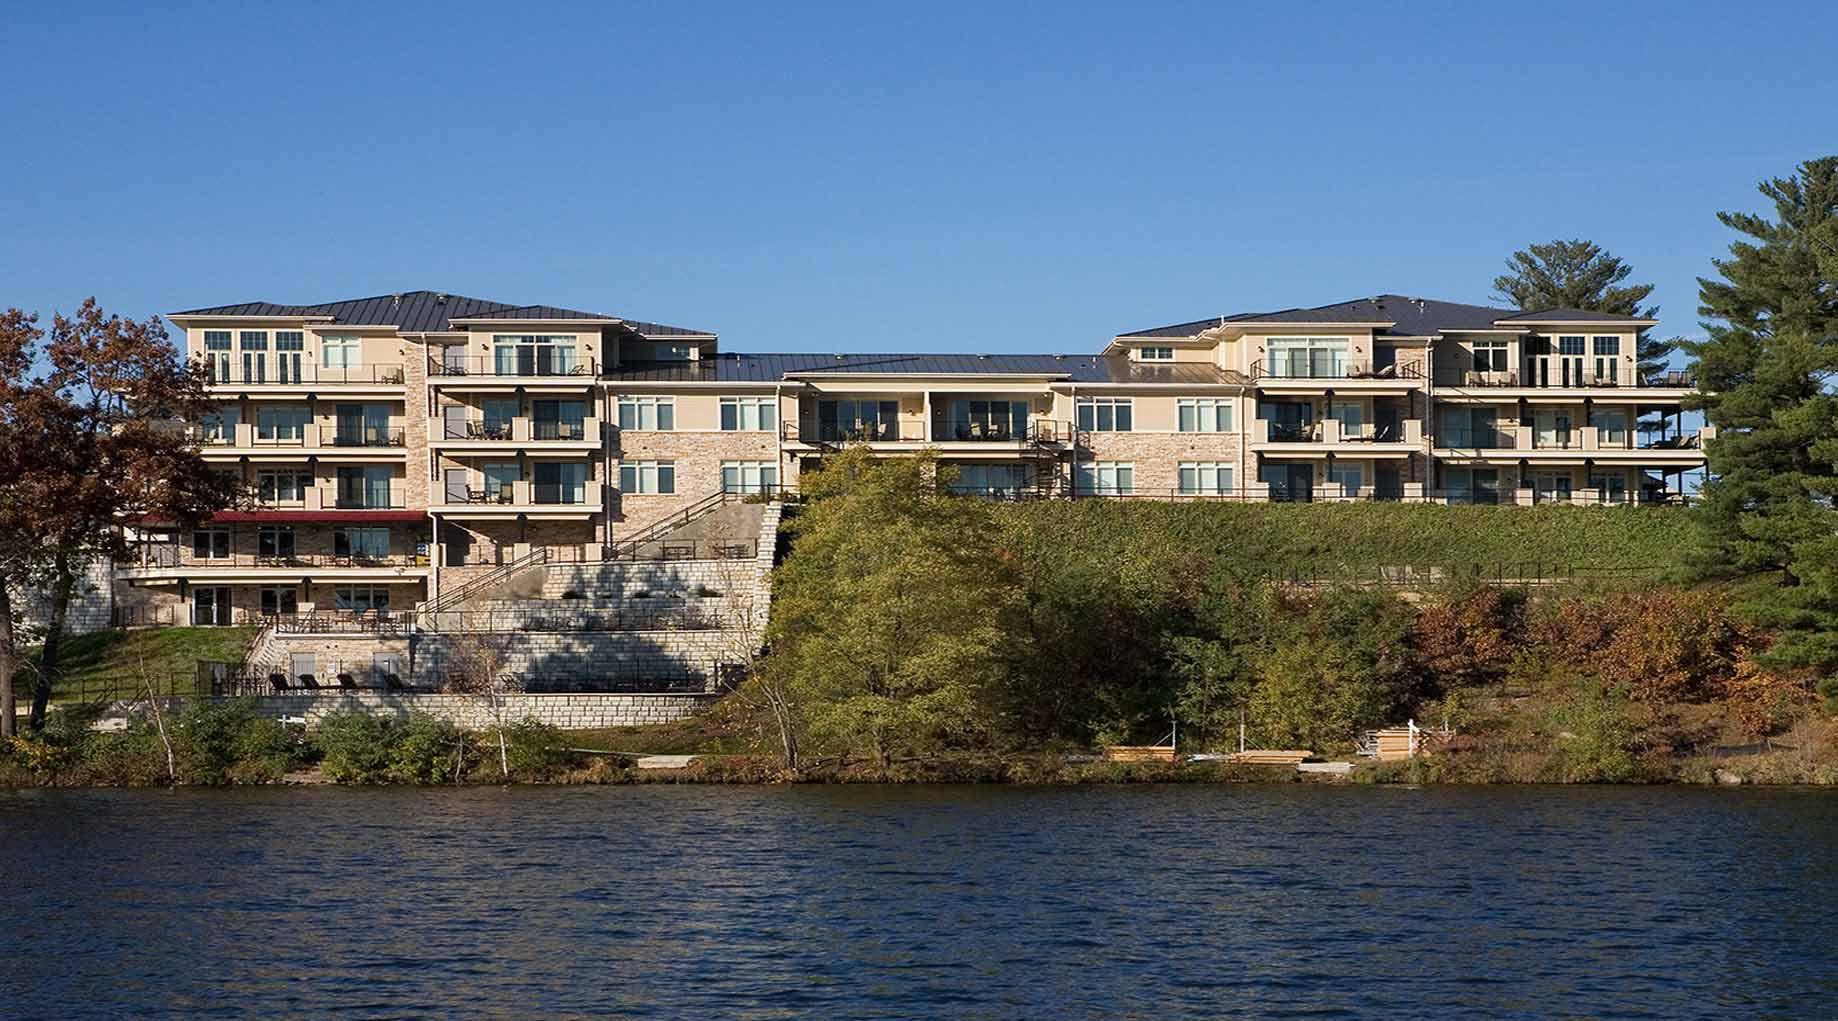 lake delton big and beautiful singles Single rooms and suites 2 bedroom suites 3-5 bedroom suites & villas lakeside villas all kalahari resort property situated on beautiful lake delton at 45.